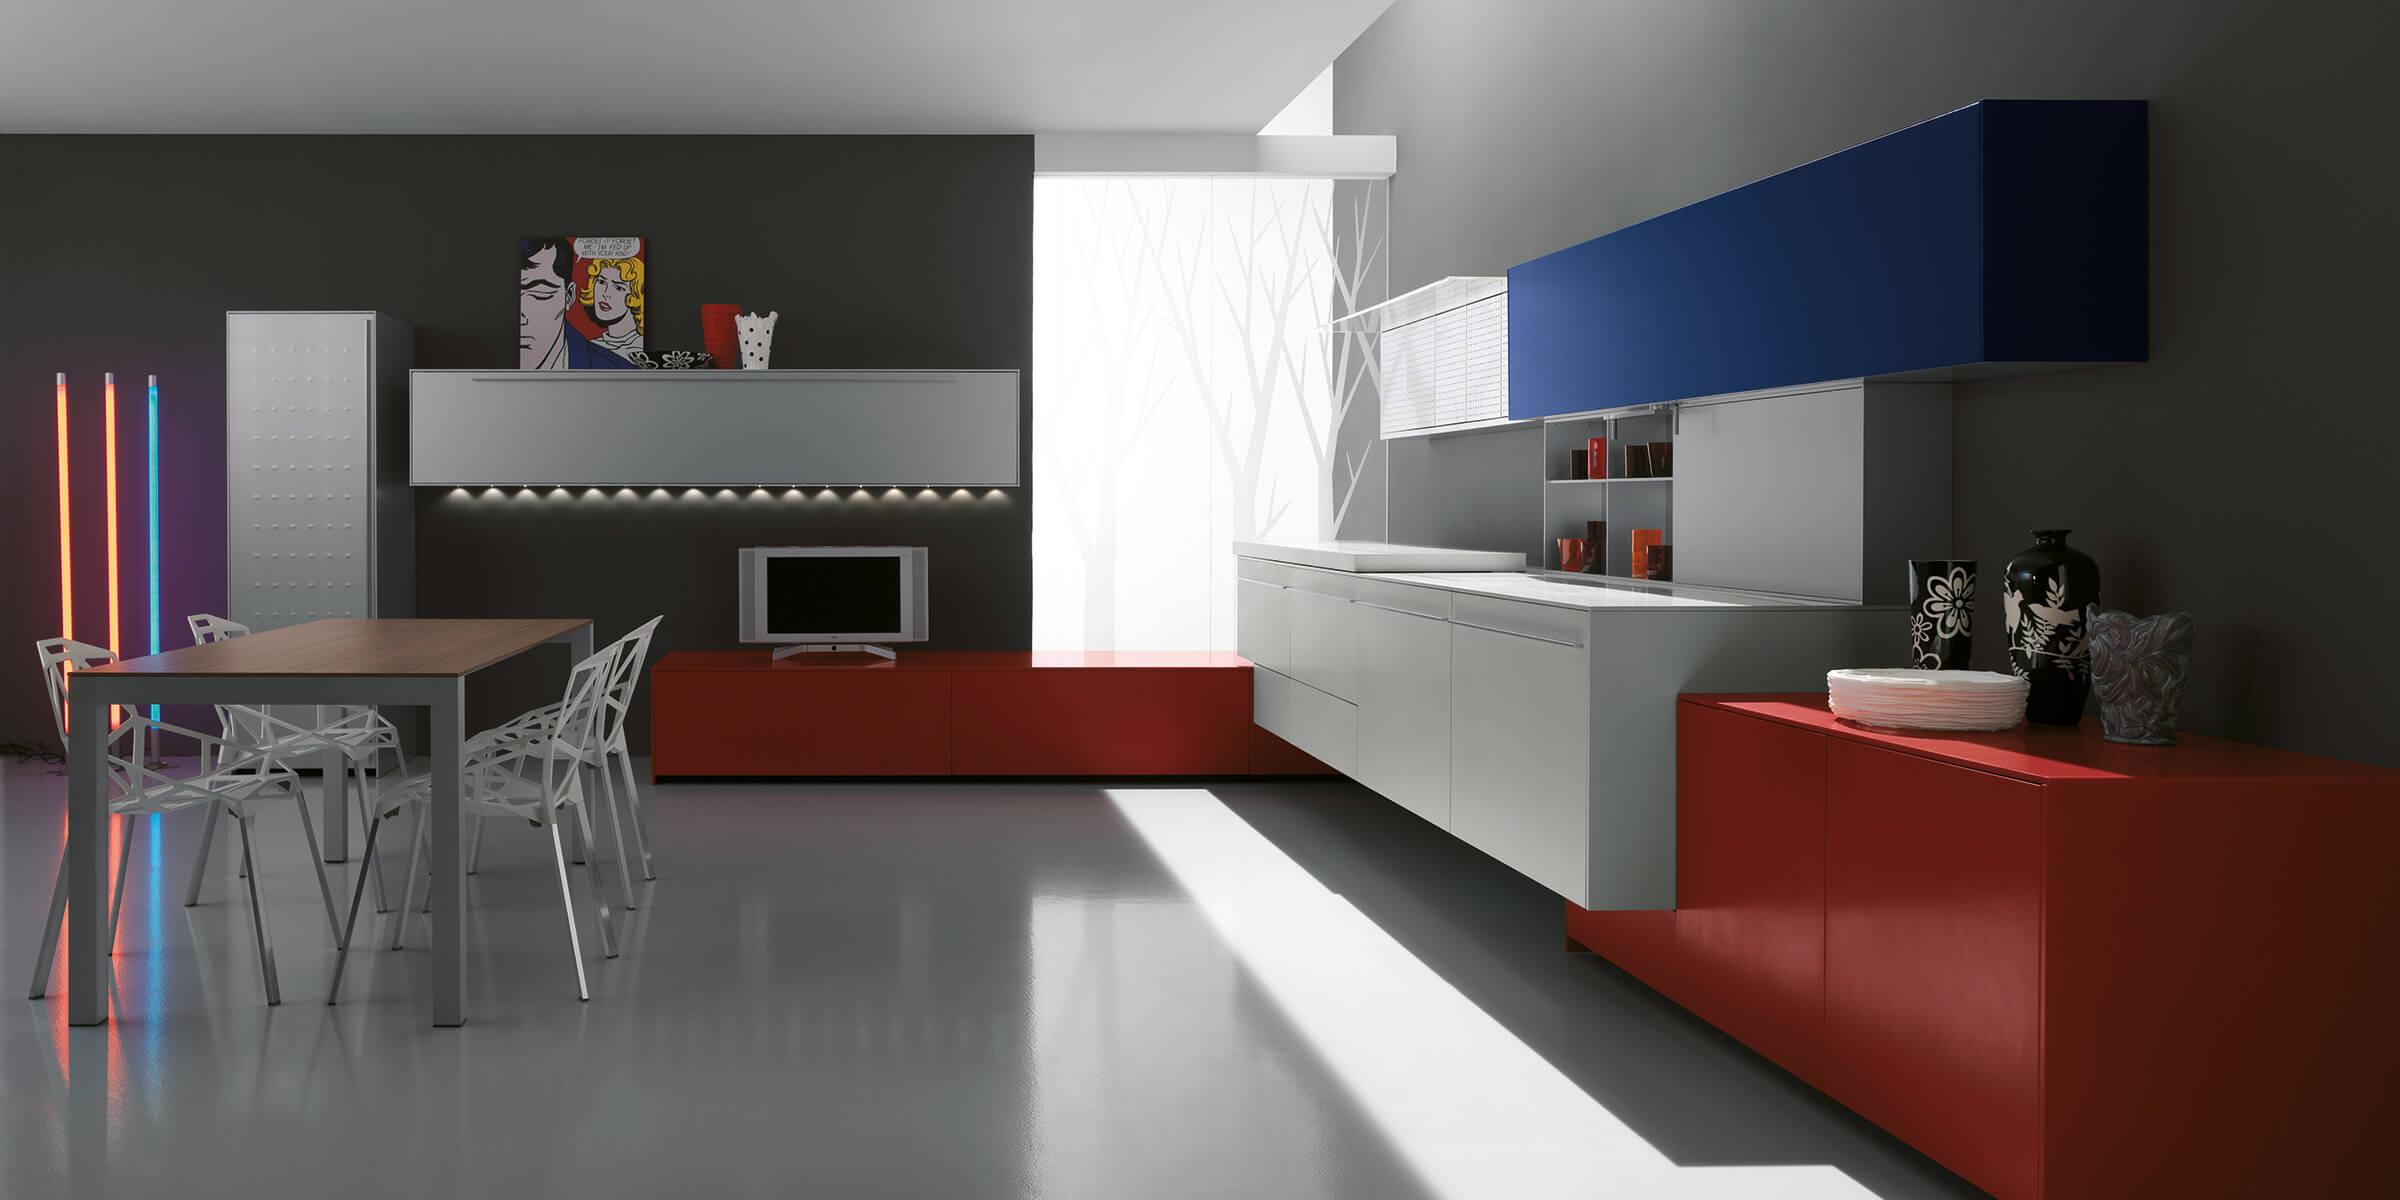 96 artematica synthesis - Cocinas Tecnológicas